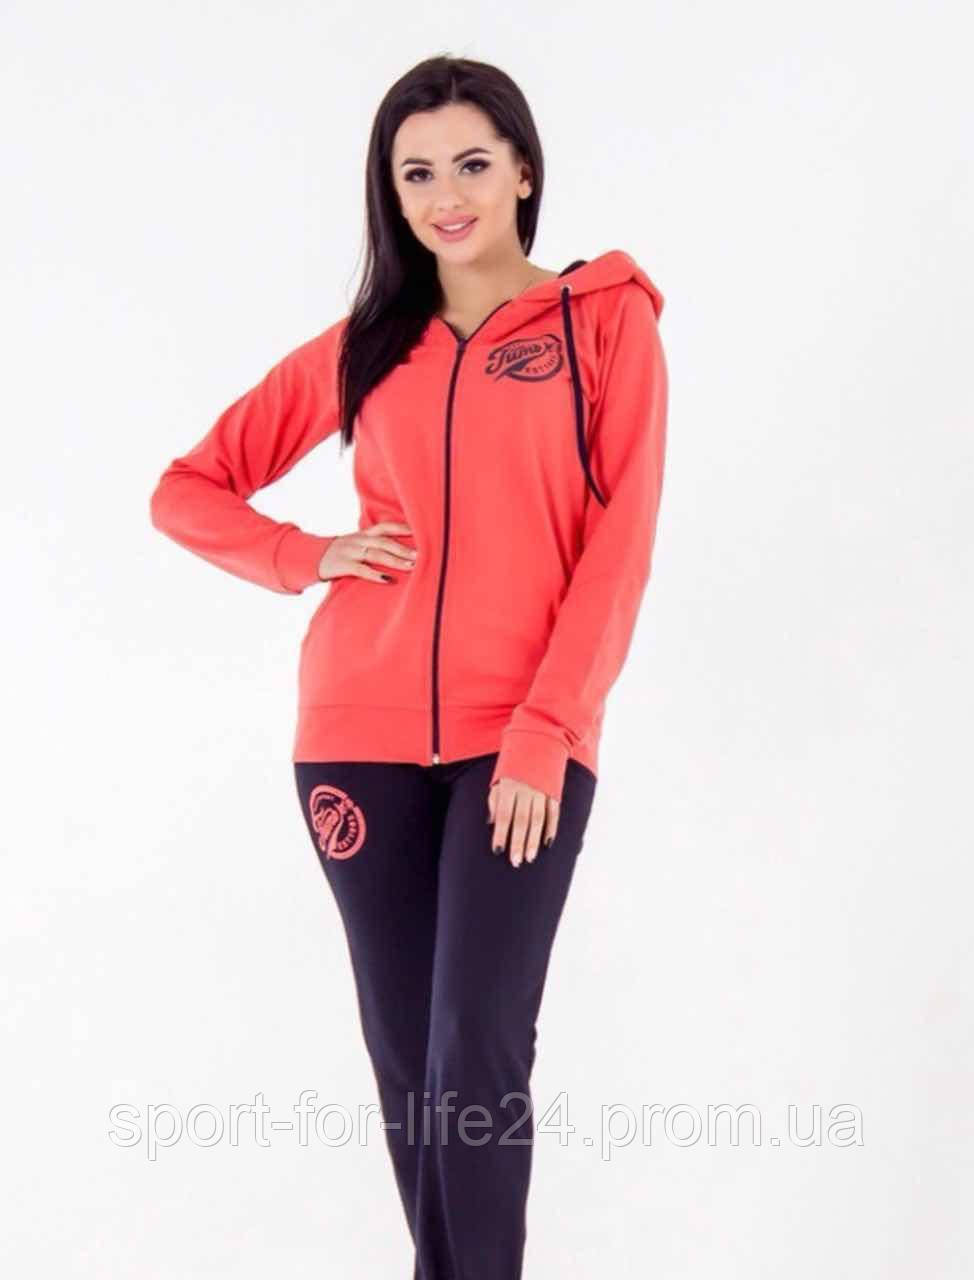 0304b957 Женский спортивный костюм Demma, цена 558 грн., купить Тростянец ...